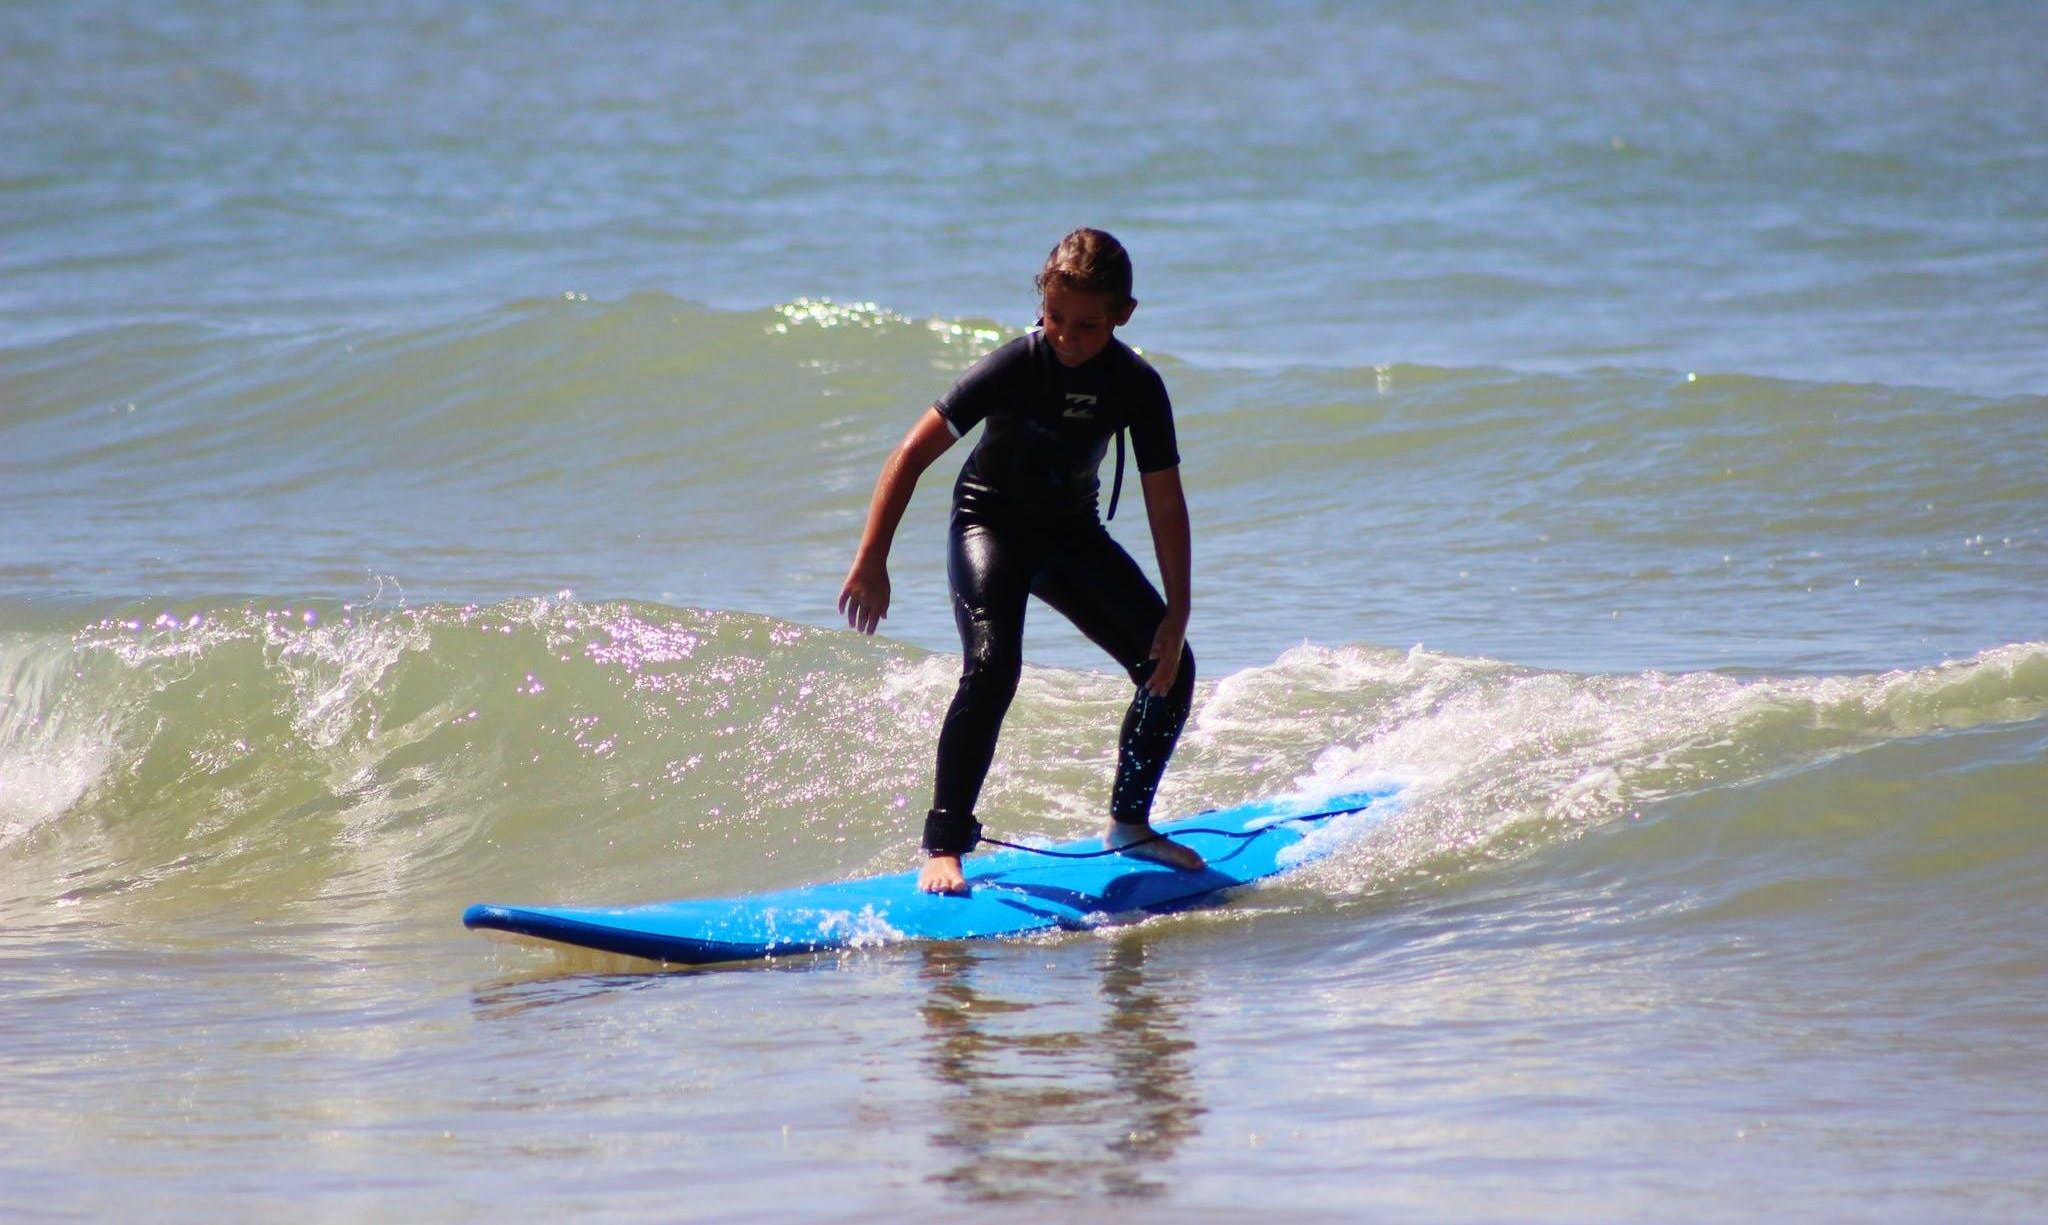 Surf Lessons in Lège-Cap-Ferret, France